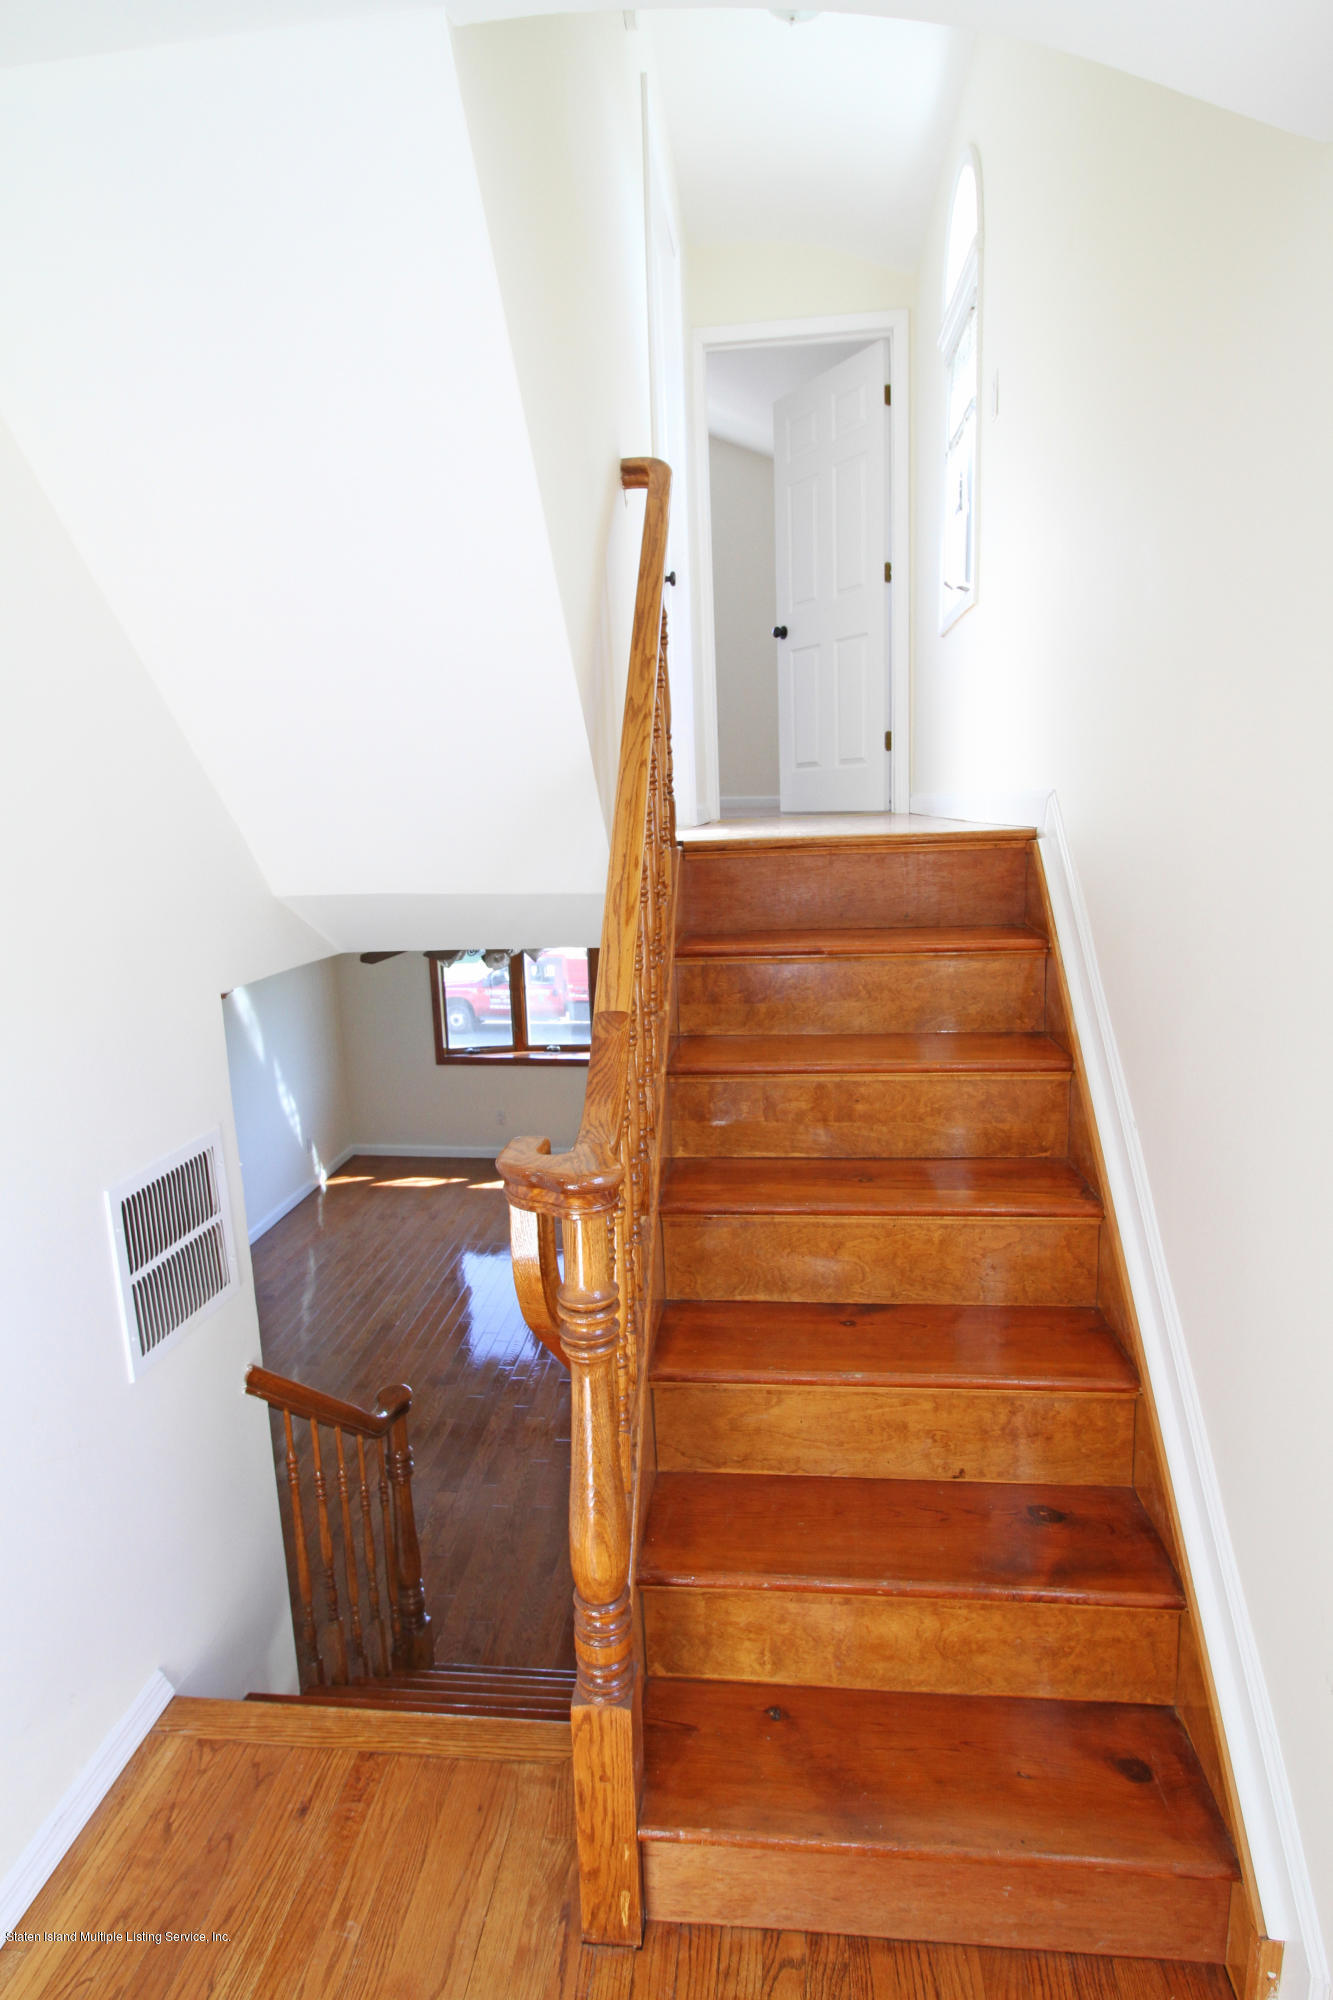 Single Family - Semi-Attached 234 Slater Boulevard  Staten Island, NY 10305, MLS-1130715-14